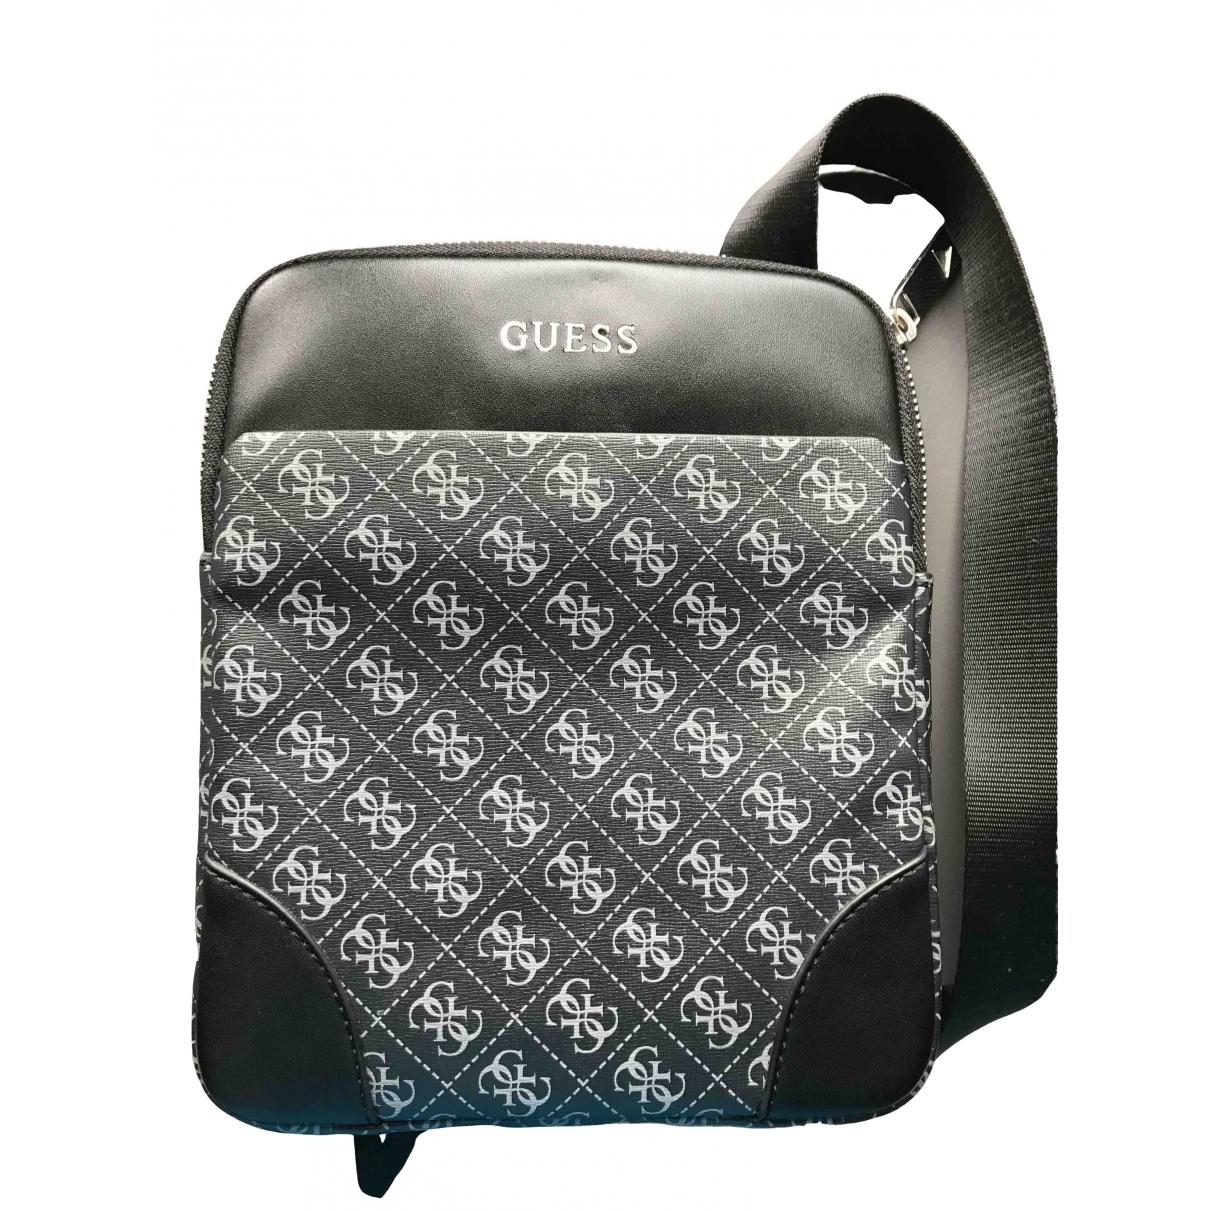 Guess \N Black Exotic leathers bag for Men \N